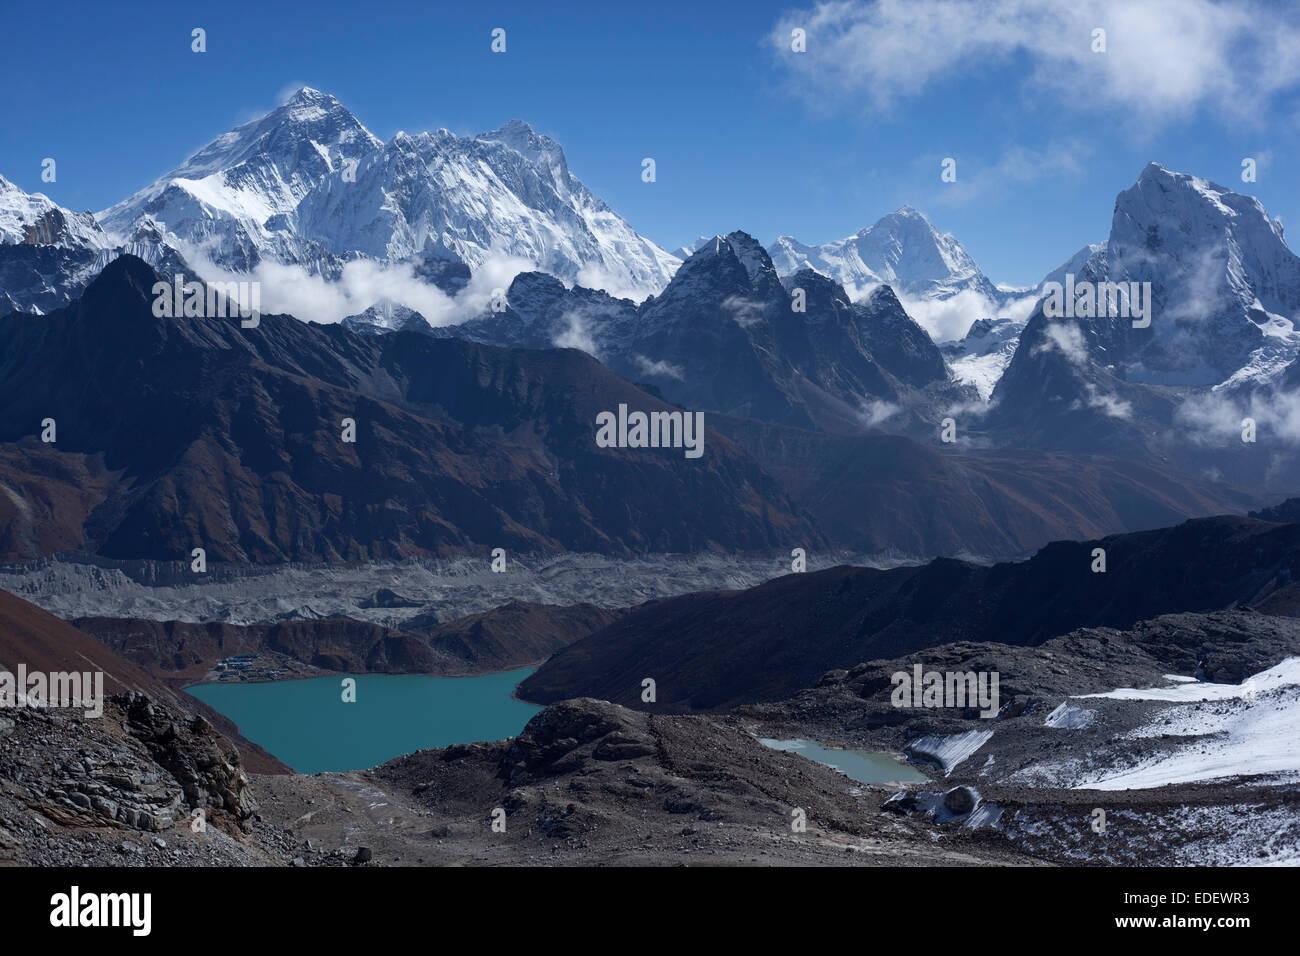 Mount Everest from Renja La Pass, Sagarmatha National Park, Nepal. - Stock Image